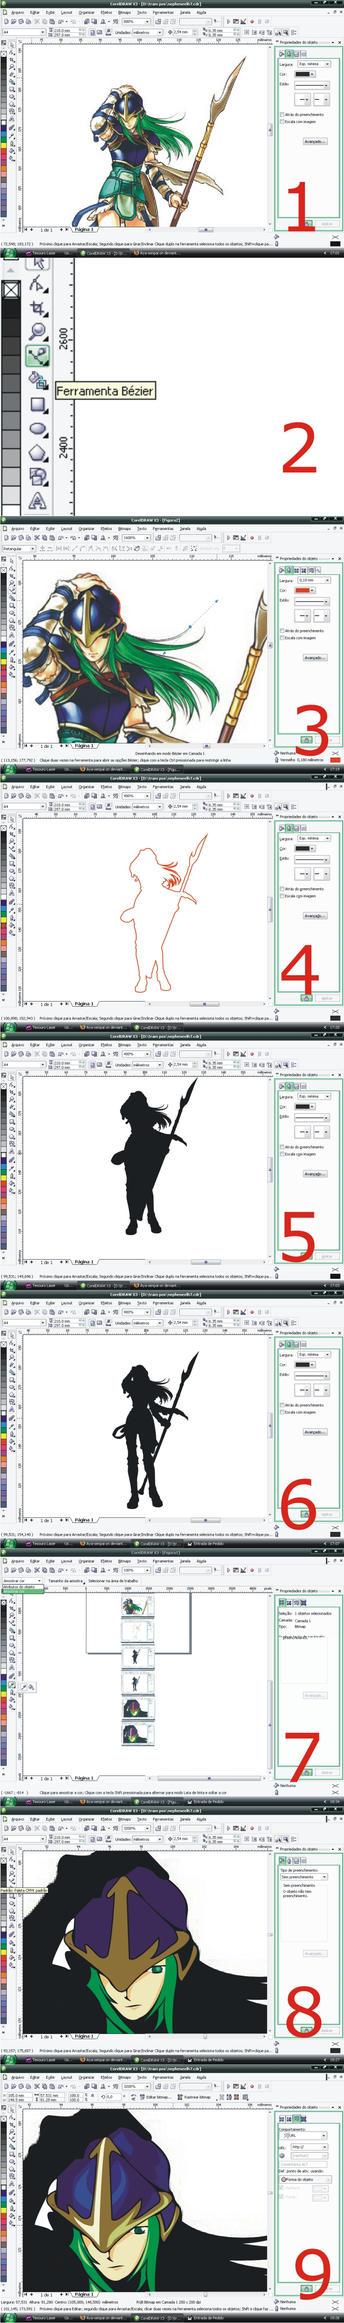 Corel Draw vectorization tutor by Aya-senpai